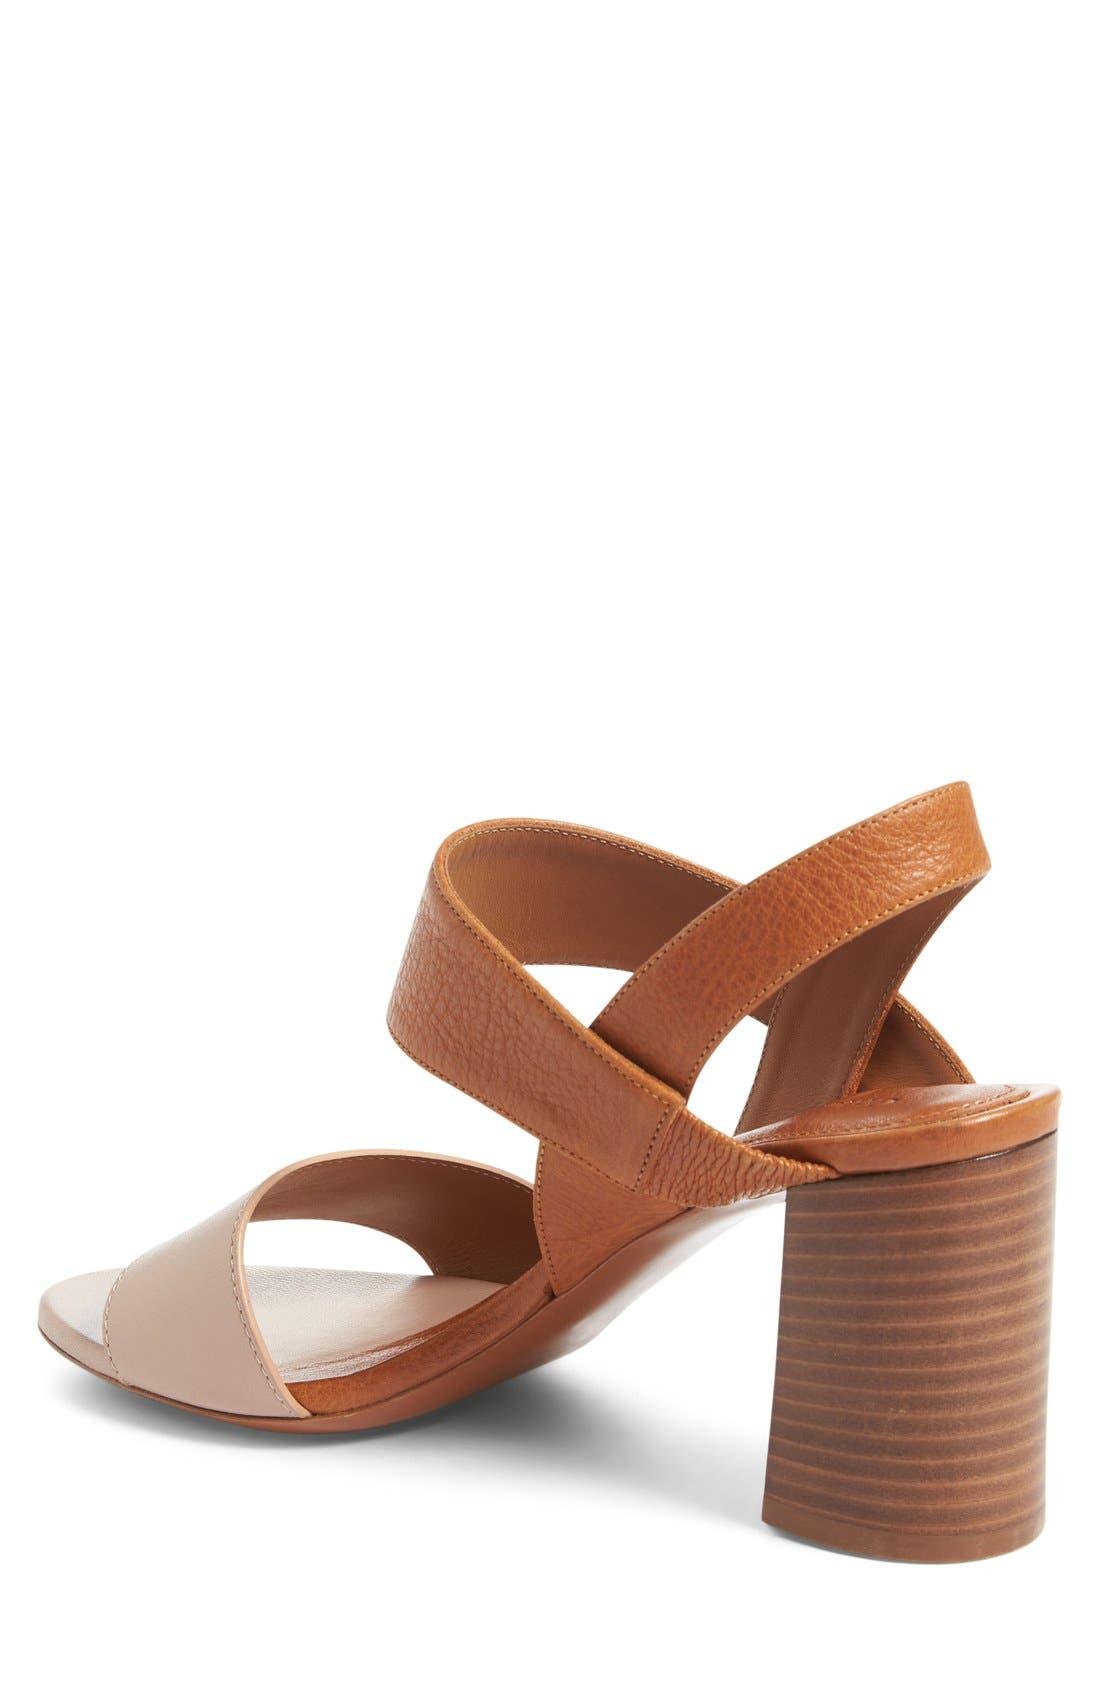 Alternate Image 2  - Chloé Mia Block Heel Sandal (Women)